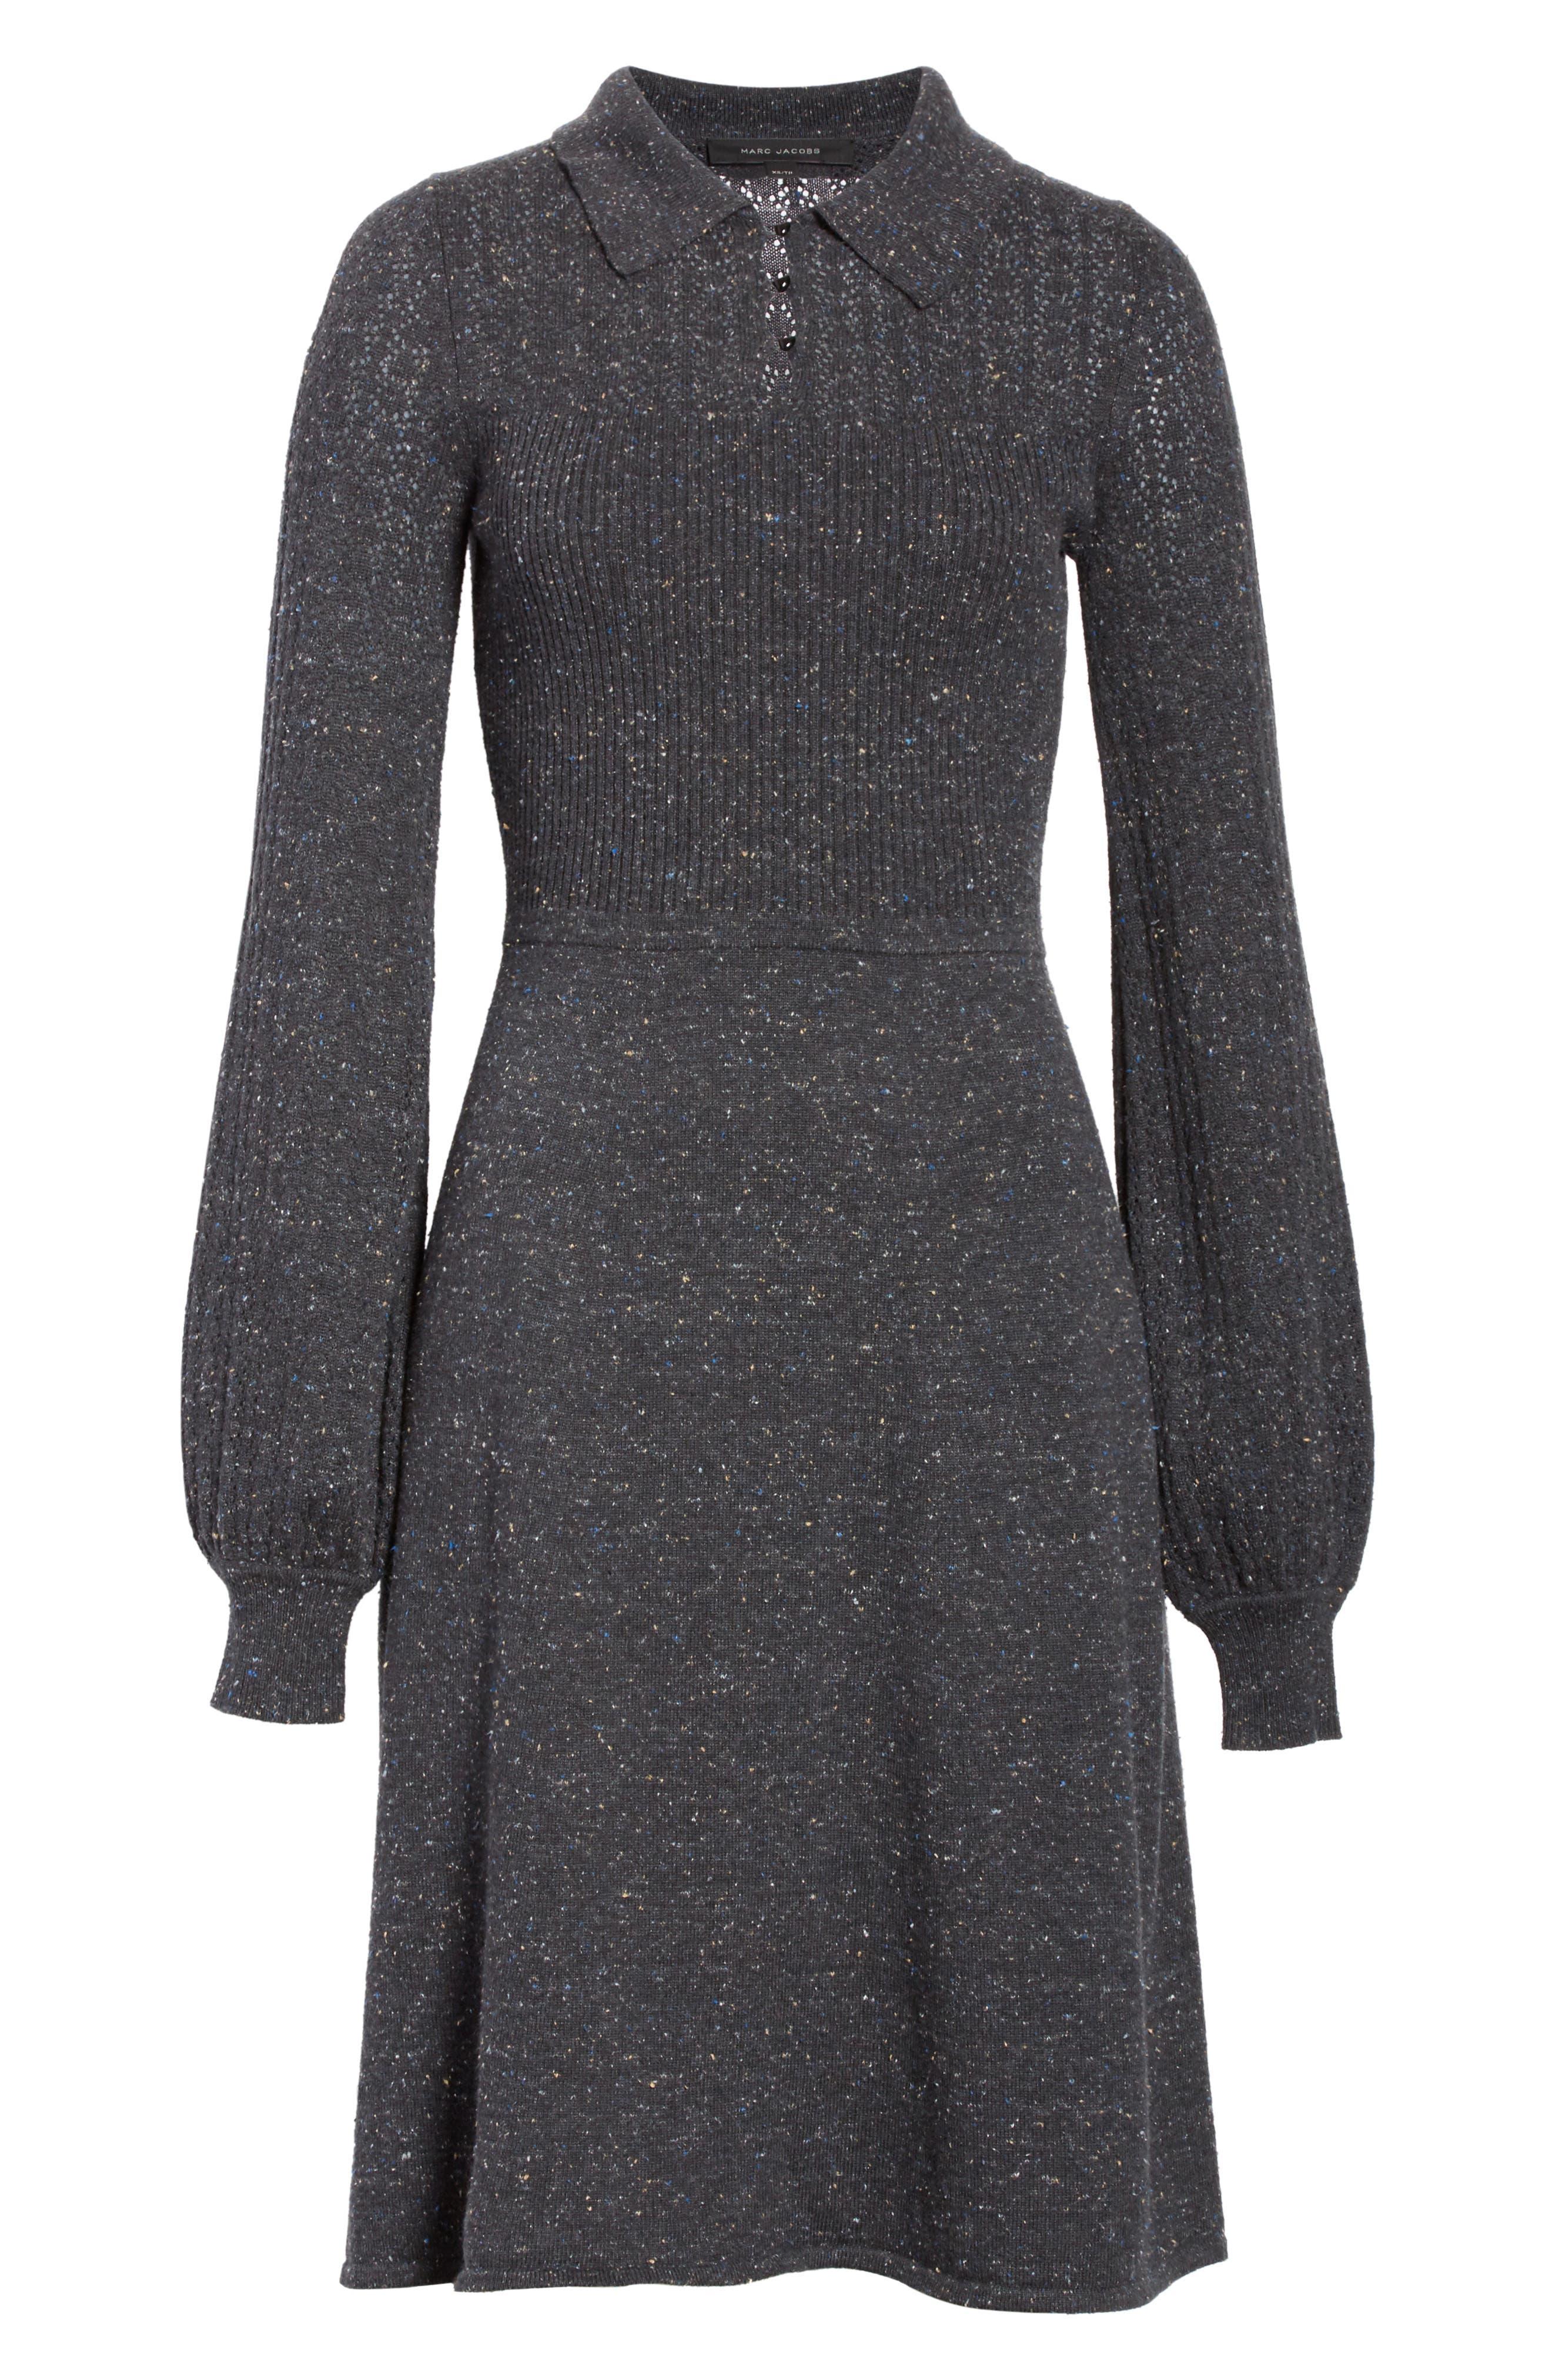 Knit Sweater Dress,                             Alternate thumbnail 6, color,                             021